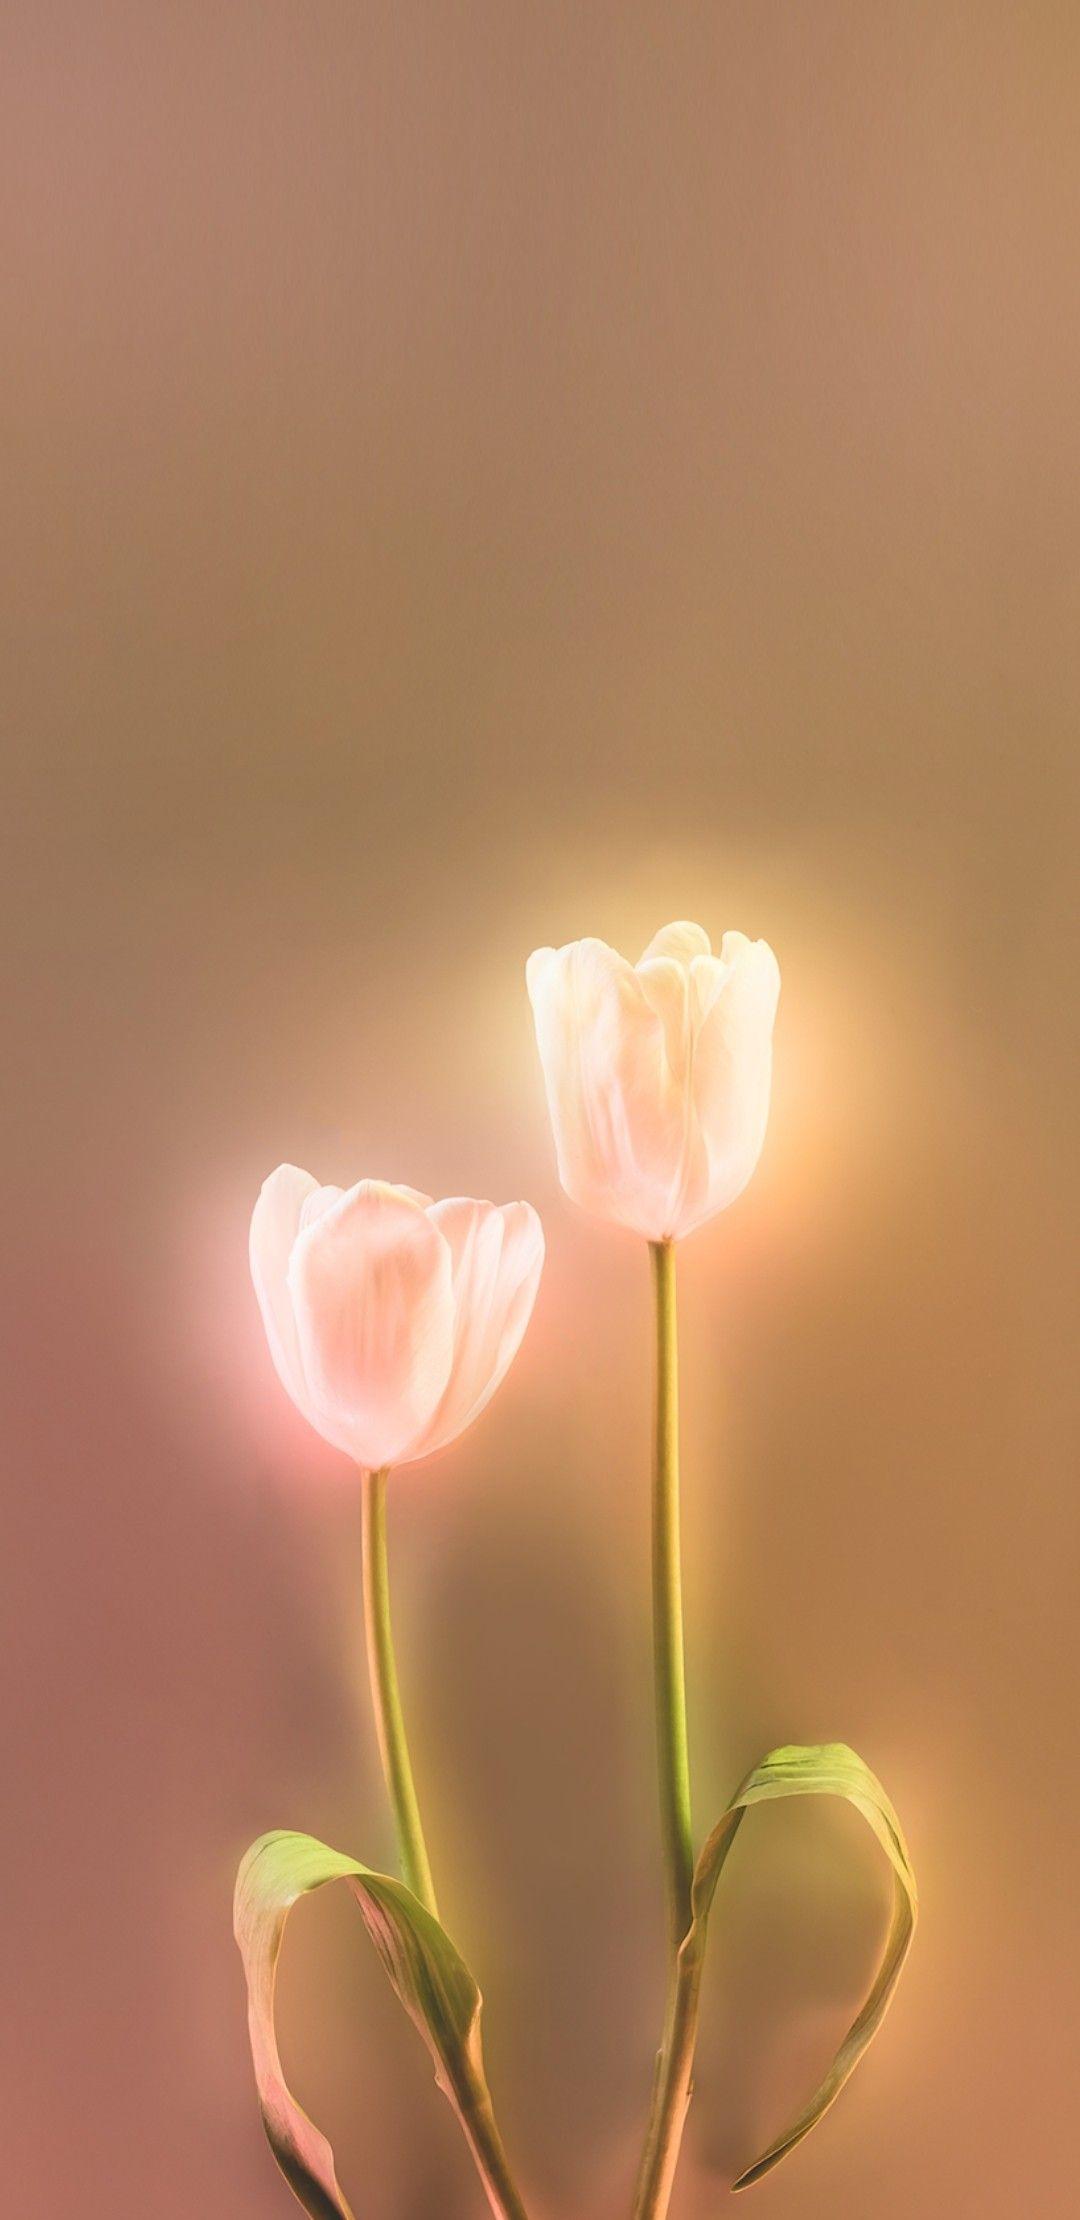 Easter Fondos De Pantalla Tulipanes Iphone Fondos De Pantalla Ideas De Fondos De Pantalla